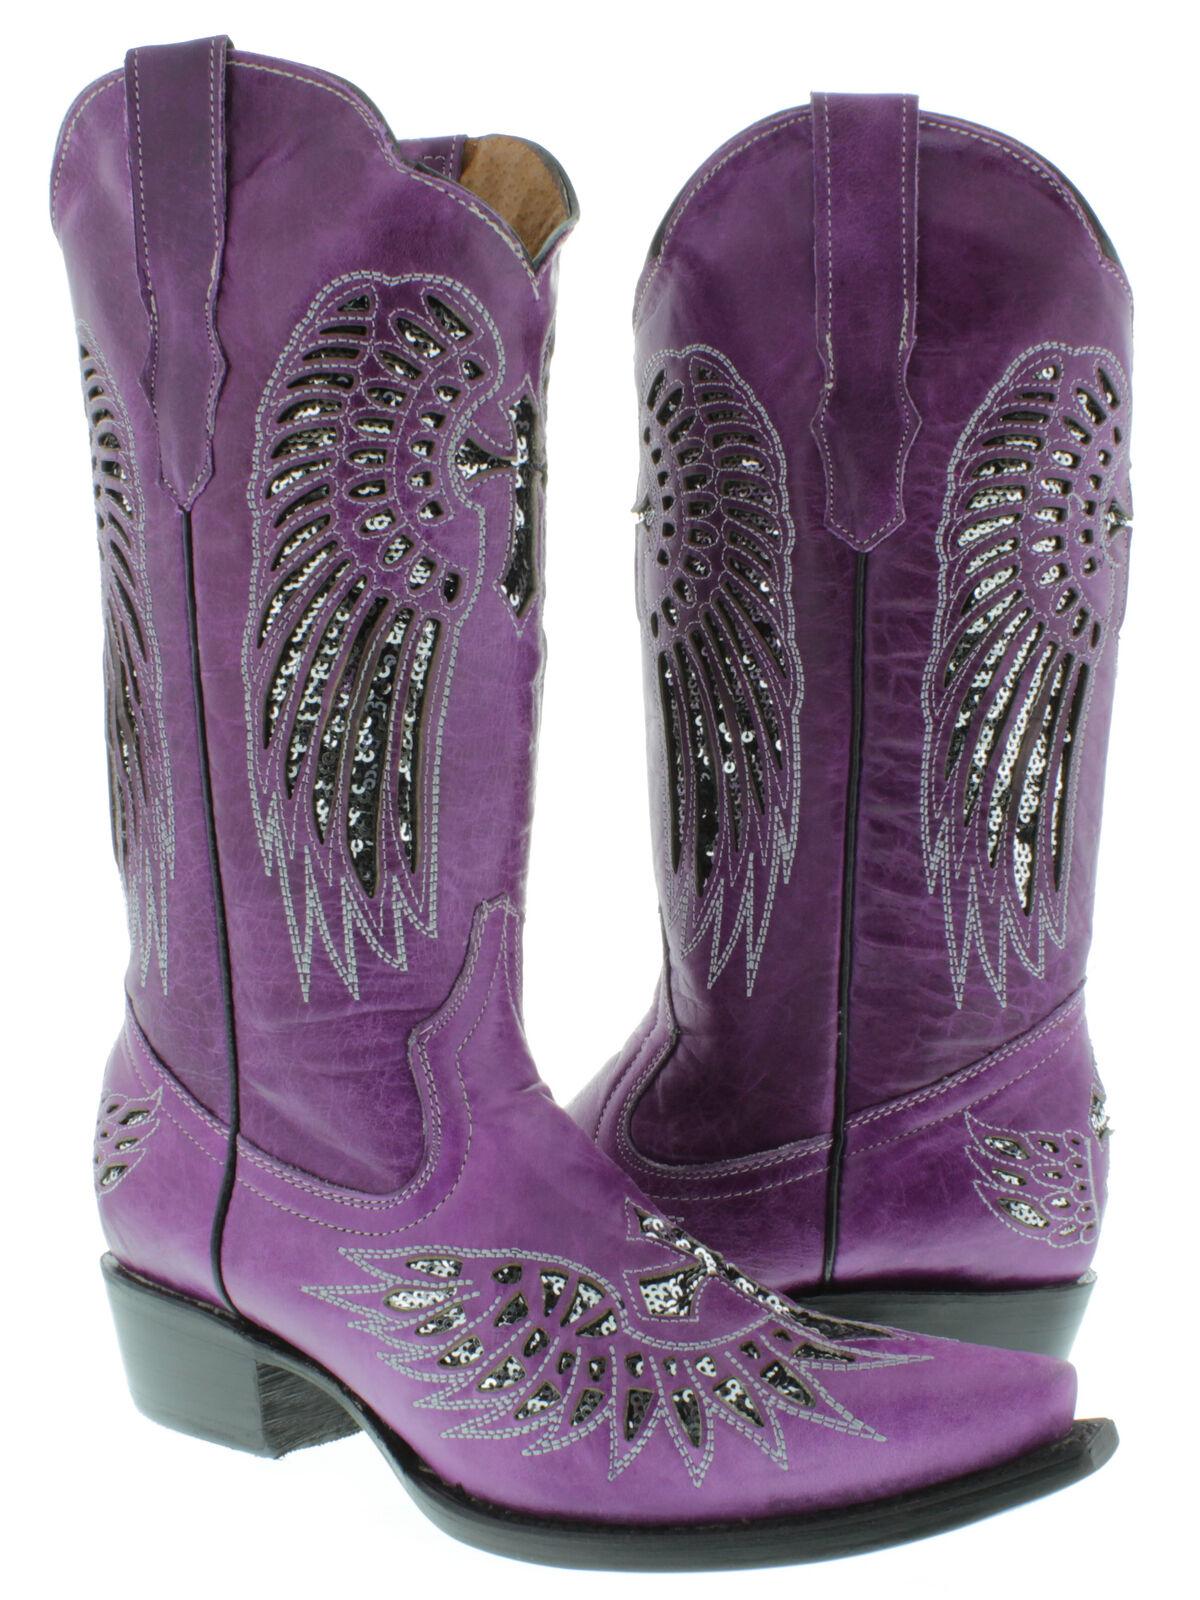 donna Cowboy stivali Cross Wing viola Leather Inlay argento Sequins  Snip Dimensione 5.5  più economico